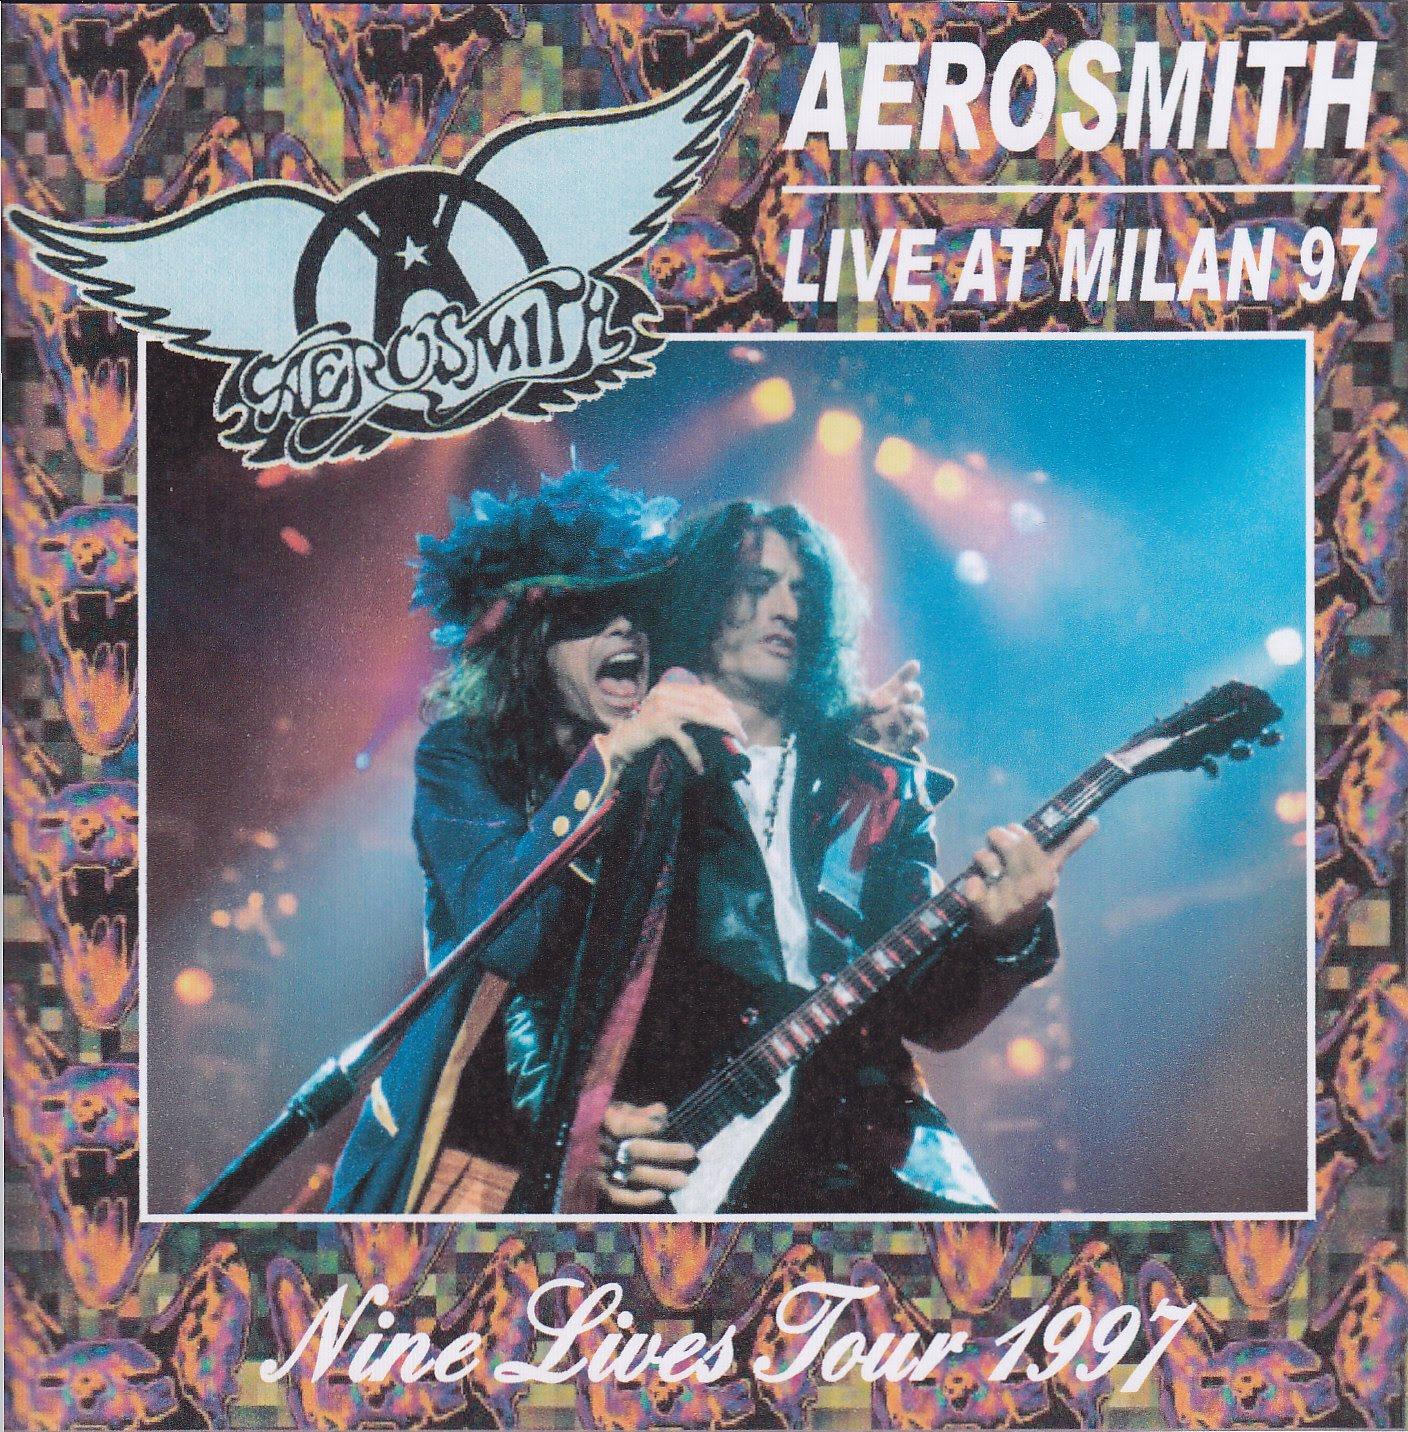 Aerosmith Bootlegs Cover Arts Live At Milan 97